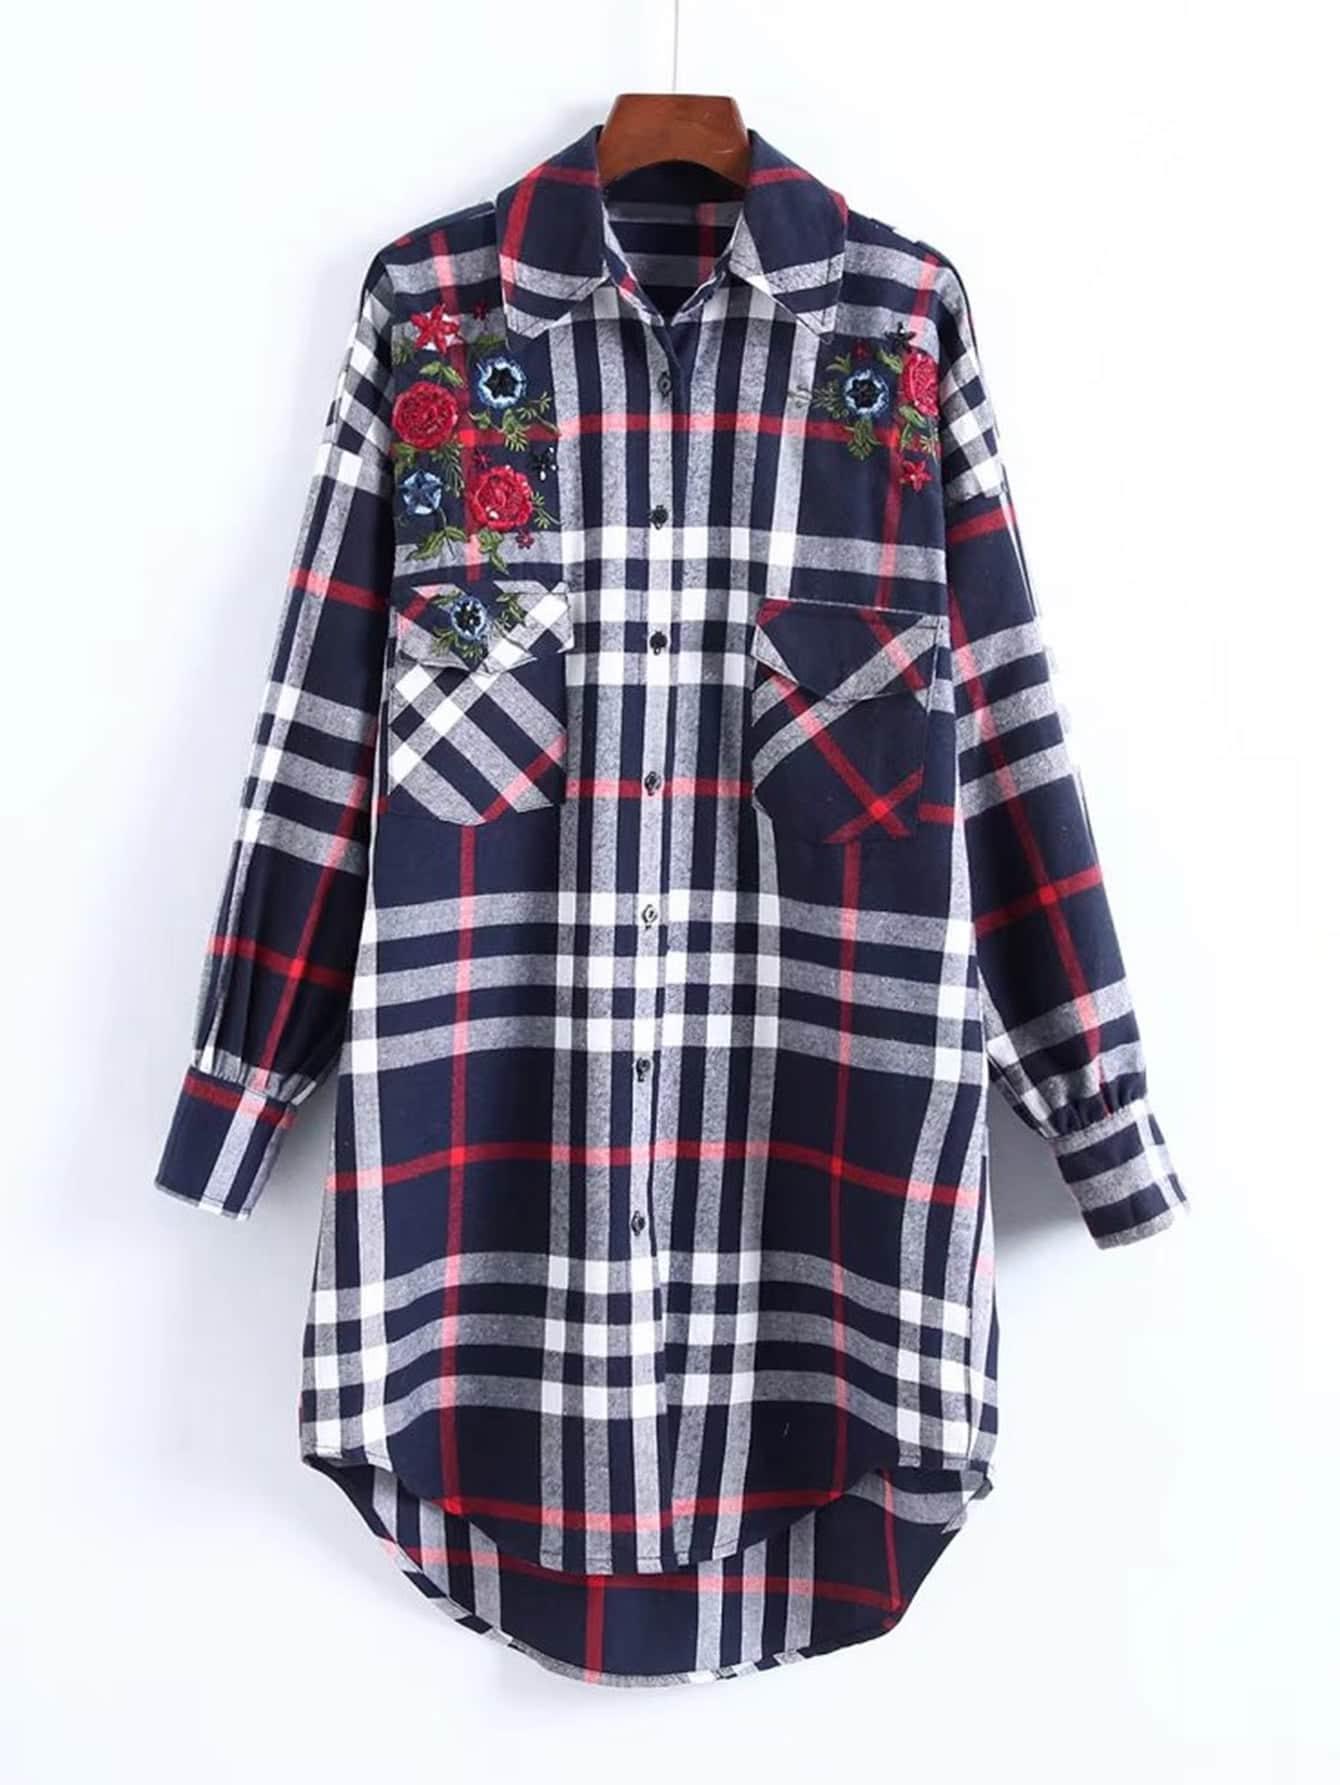 Embroidered Dolphin Hem Check Shirt Dress check plaid letter embroidered shirt dress